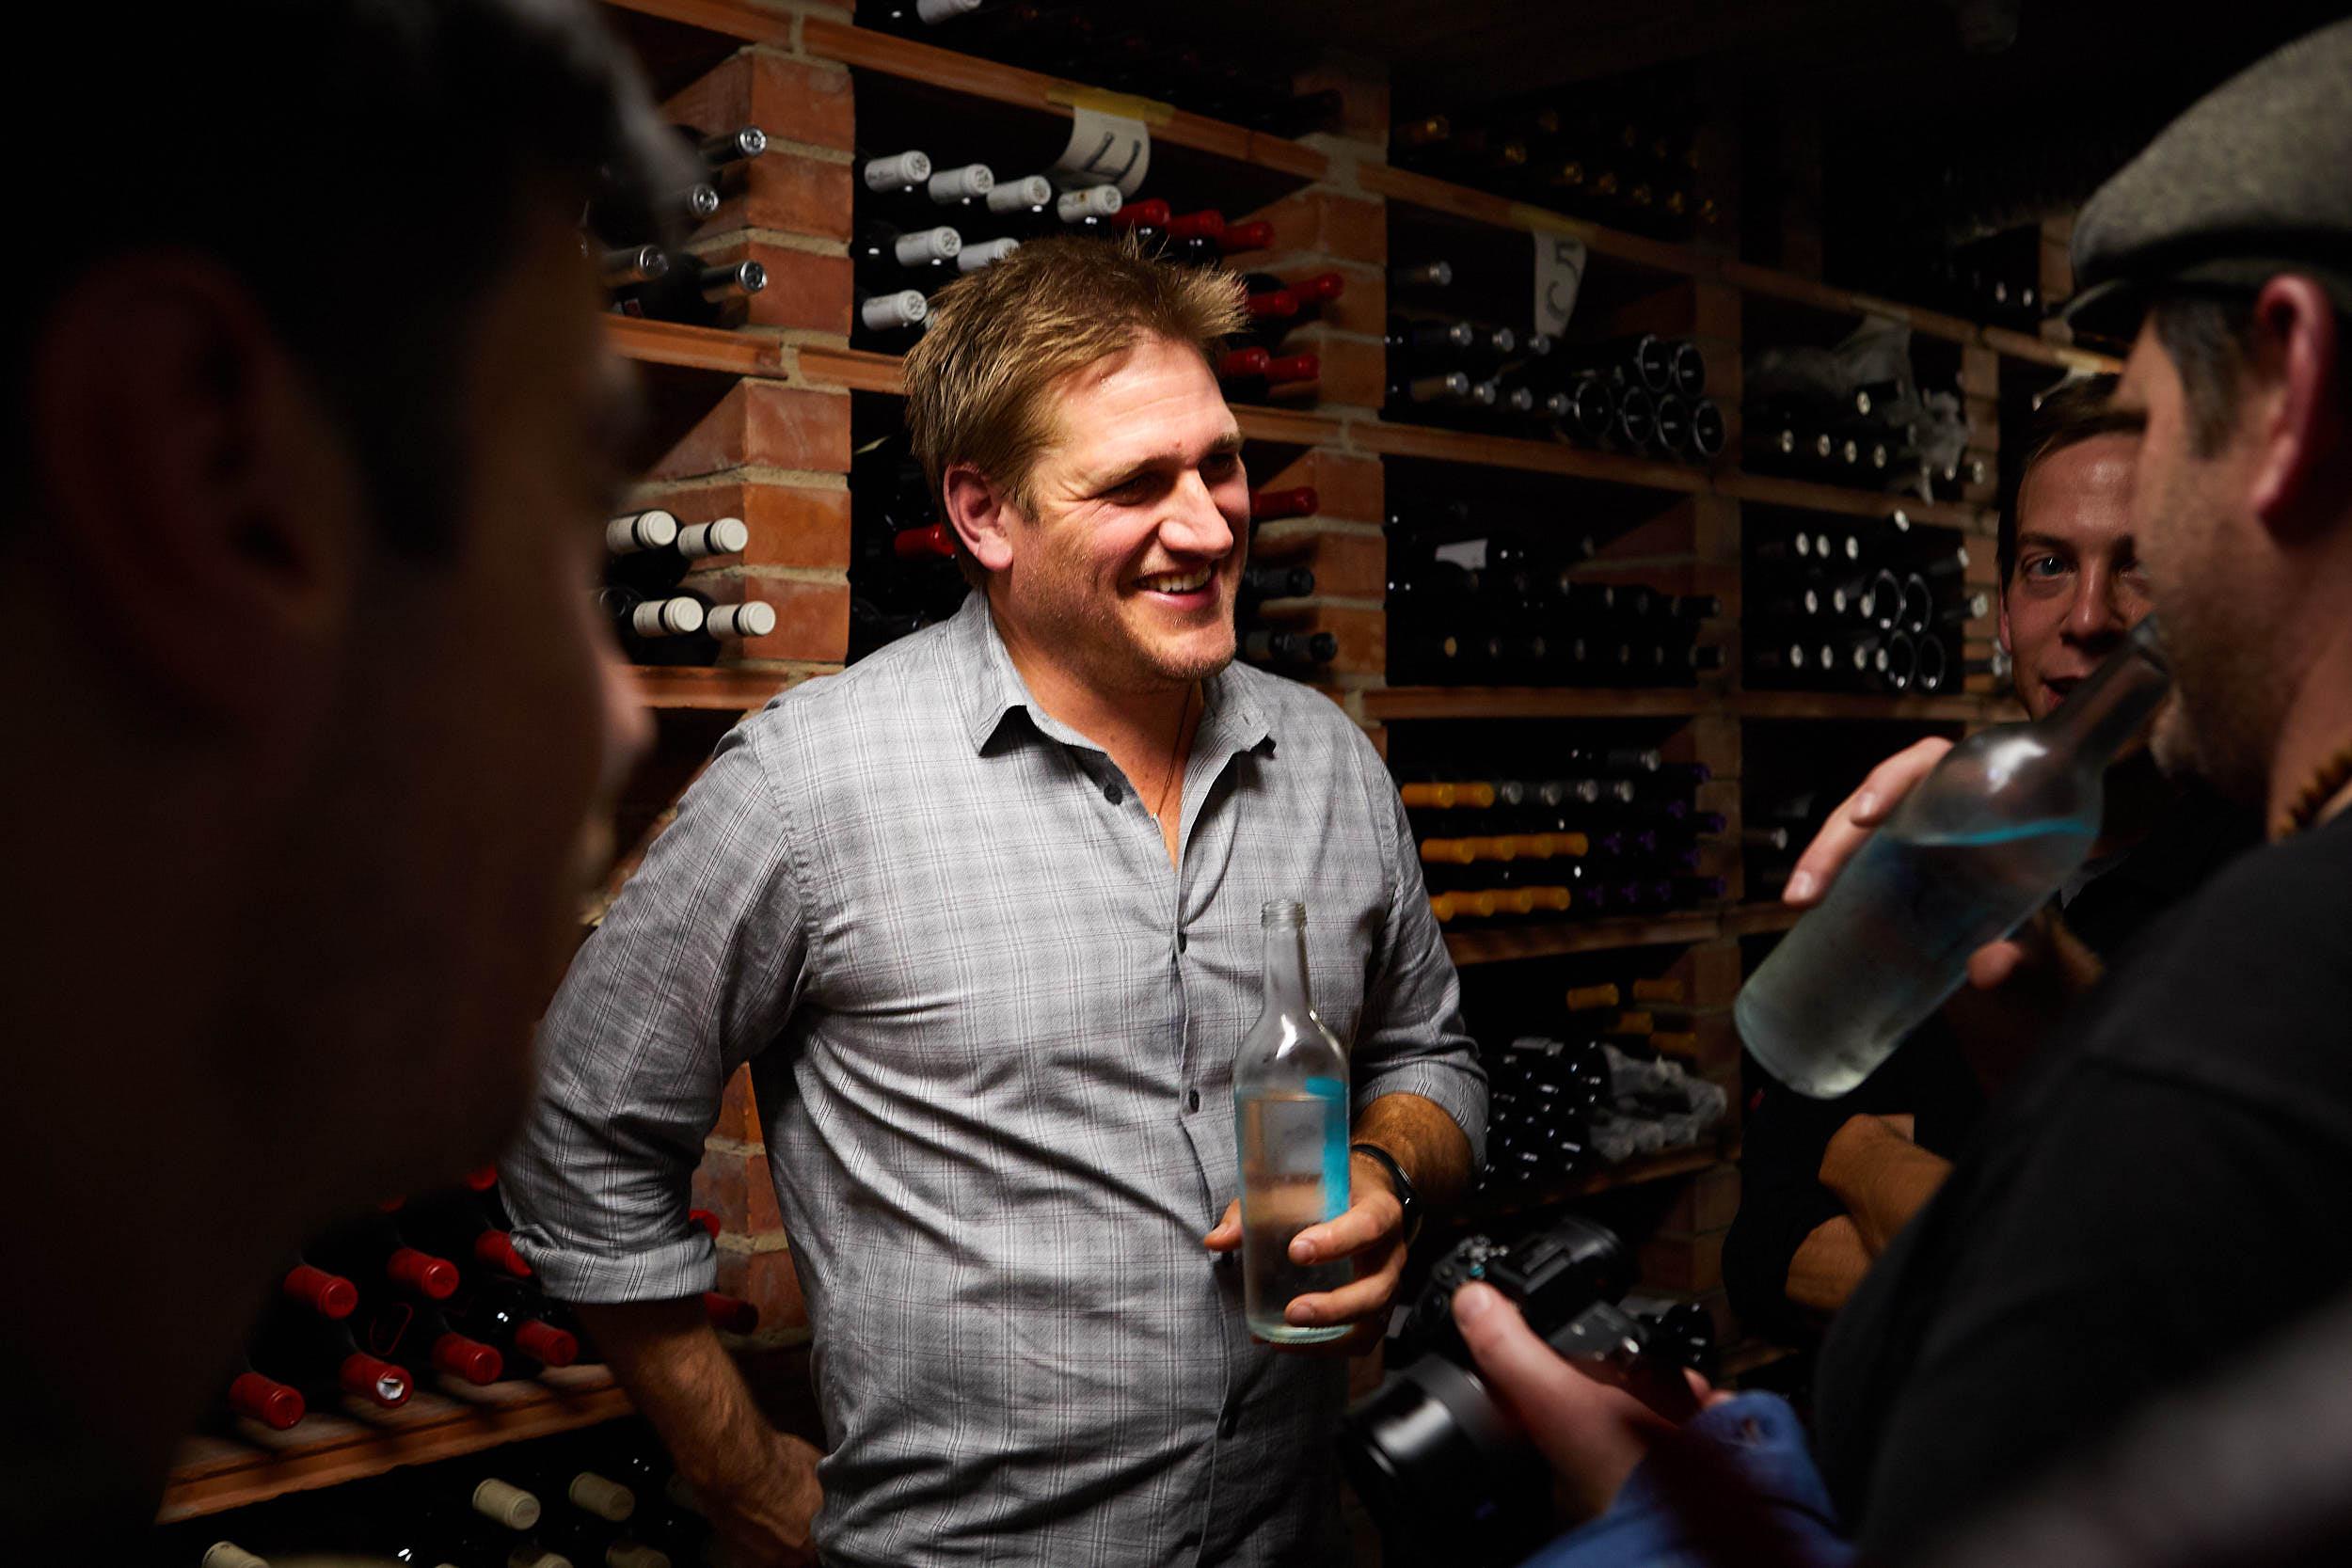 Fotografo_Profesional_La_Rioja_Pais_Vasco_Spain_Chef_Curtis_Stone_Sturcke_001.jpg